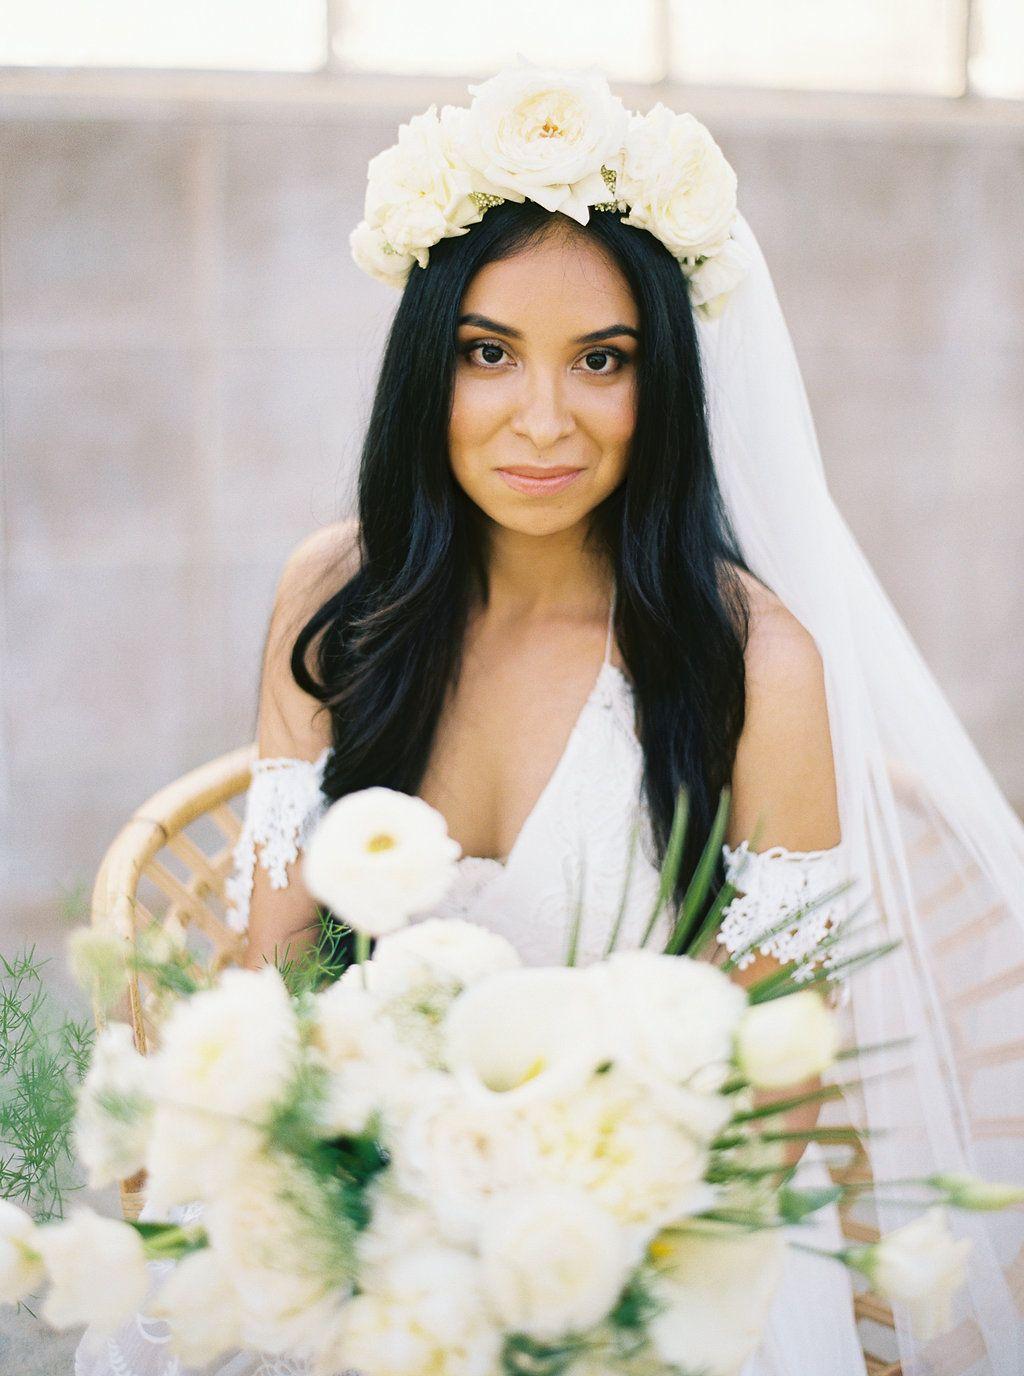 Tulum Inspired Wedding With White + Rattan Wedding